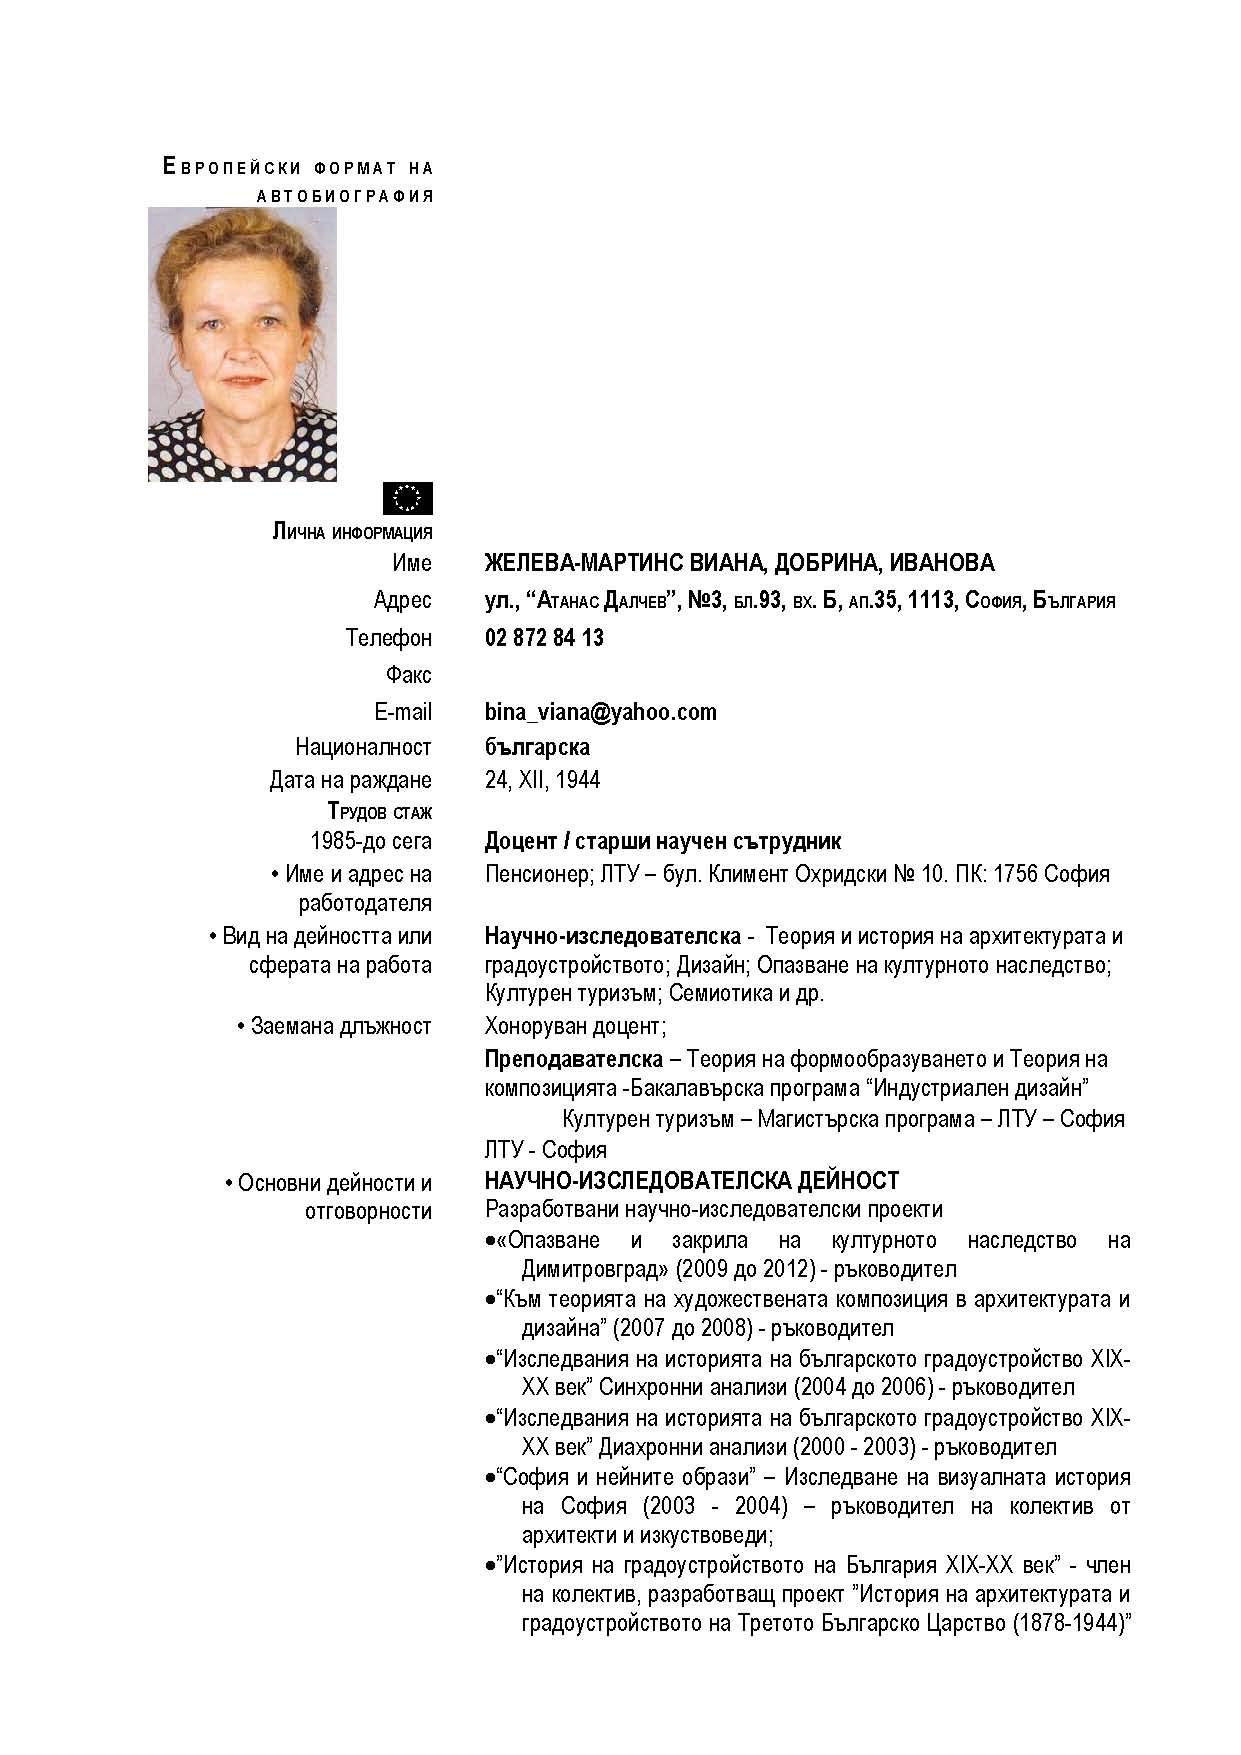 1 page resume format sample customer service resume 1 page resume format cv template modern one page format careeroneau Доцент д р арх Добрина